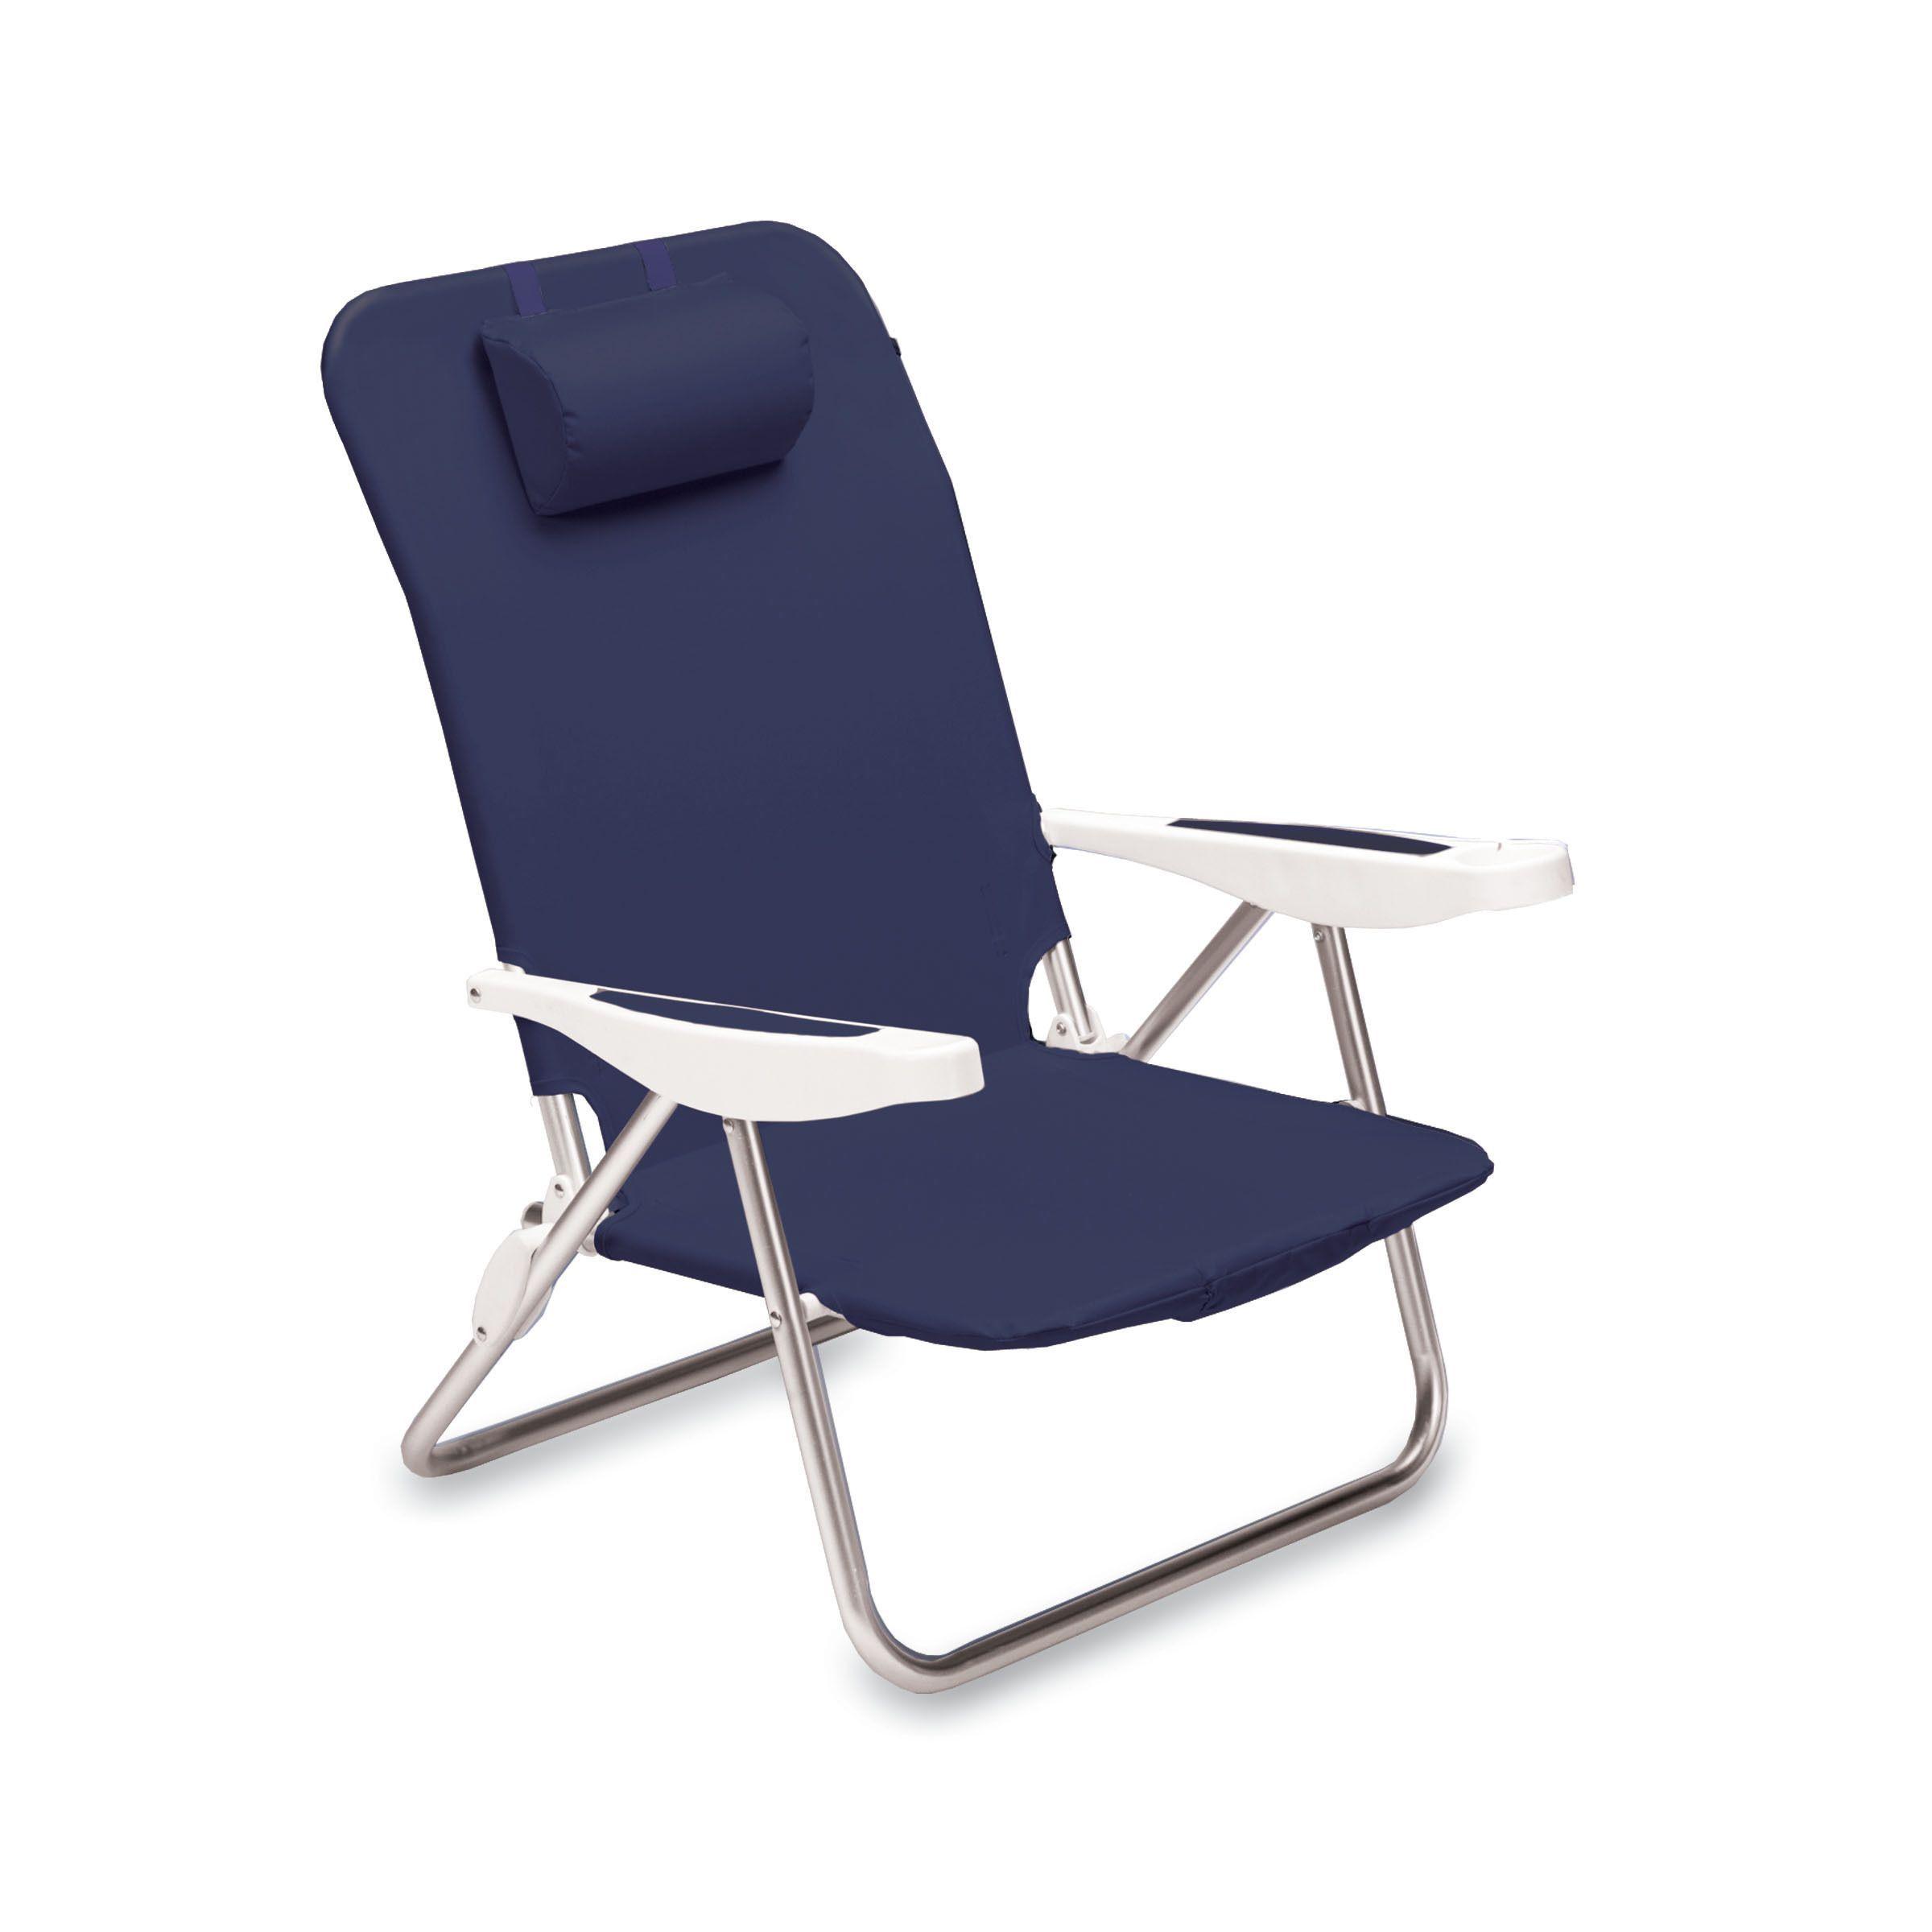 Monaco Beach Chair Backpack Chair by iva